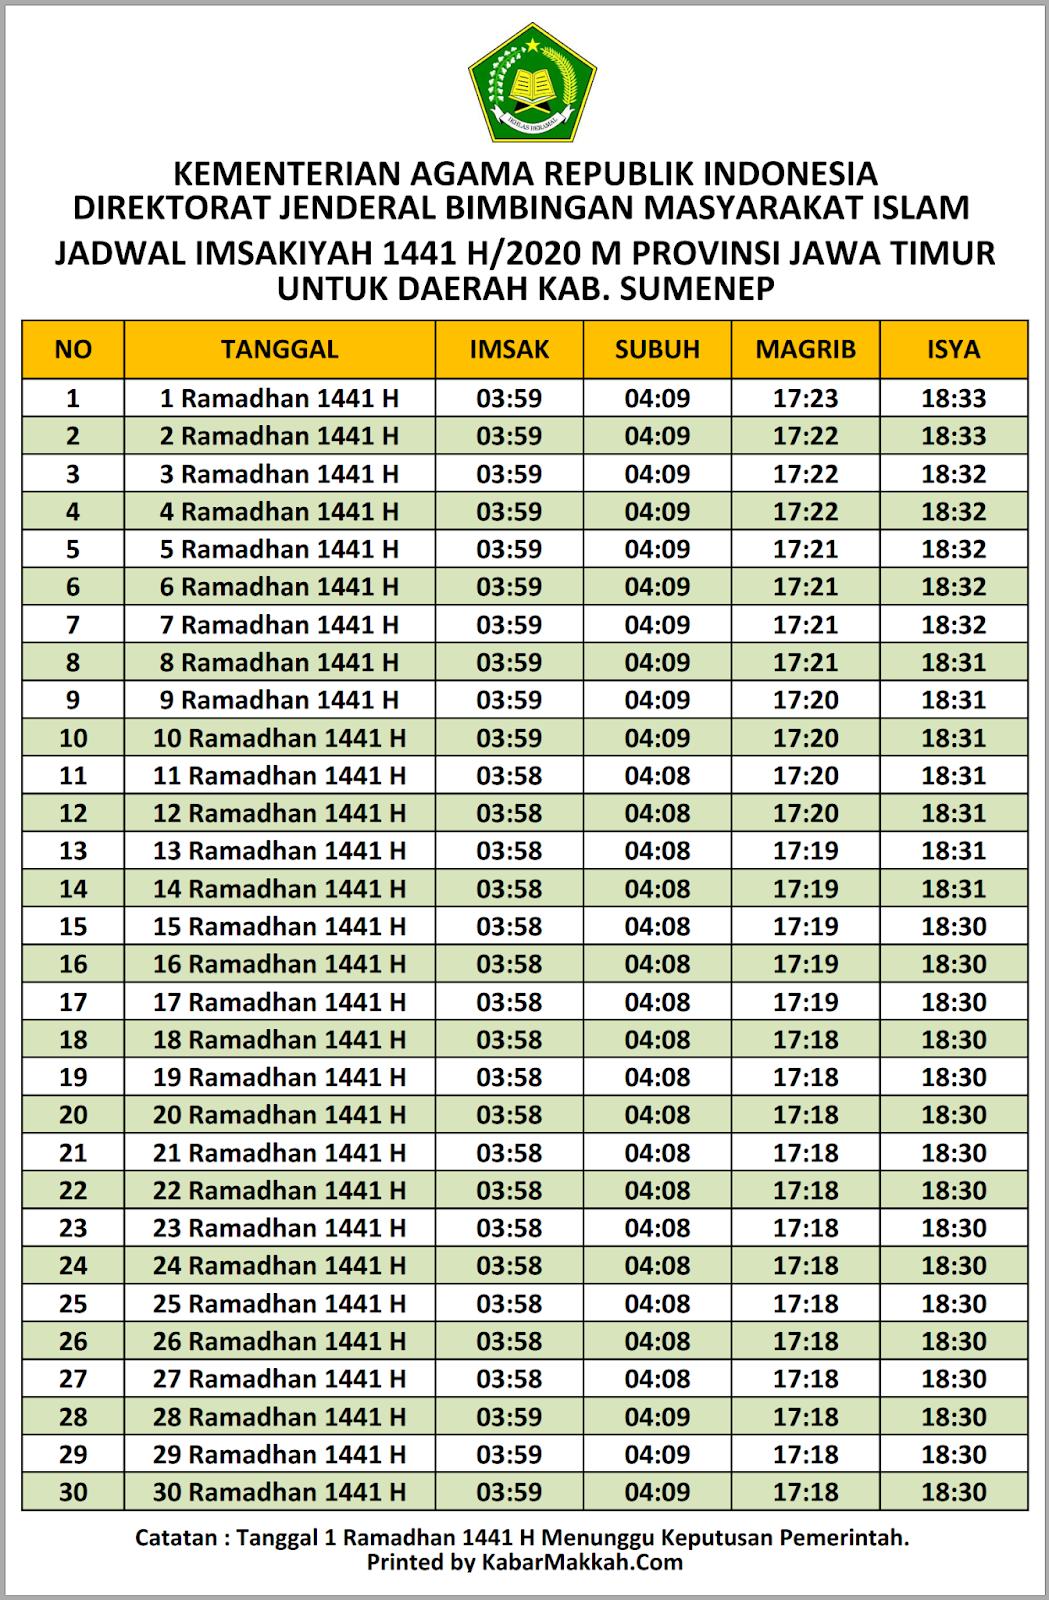 Jadwal Imsakiyah Sumenep 2020